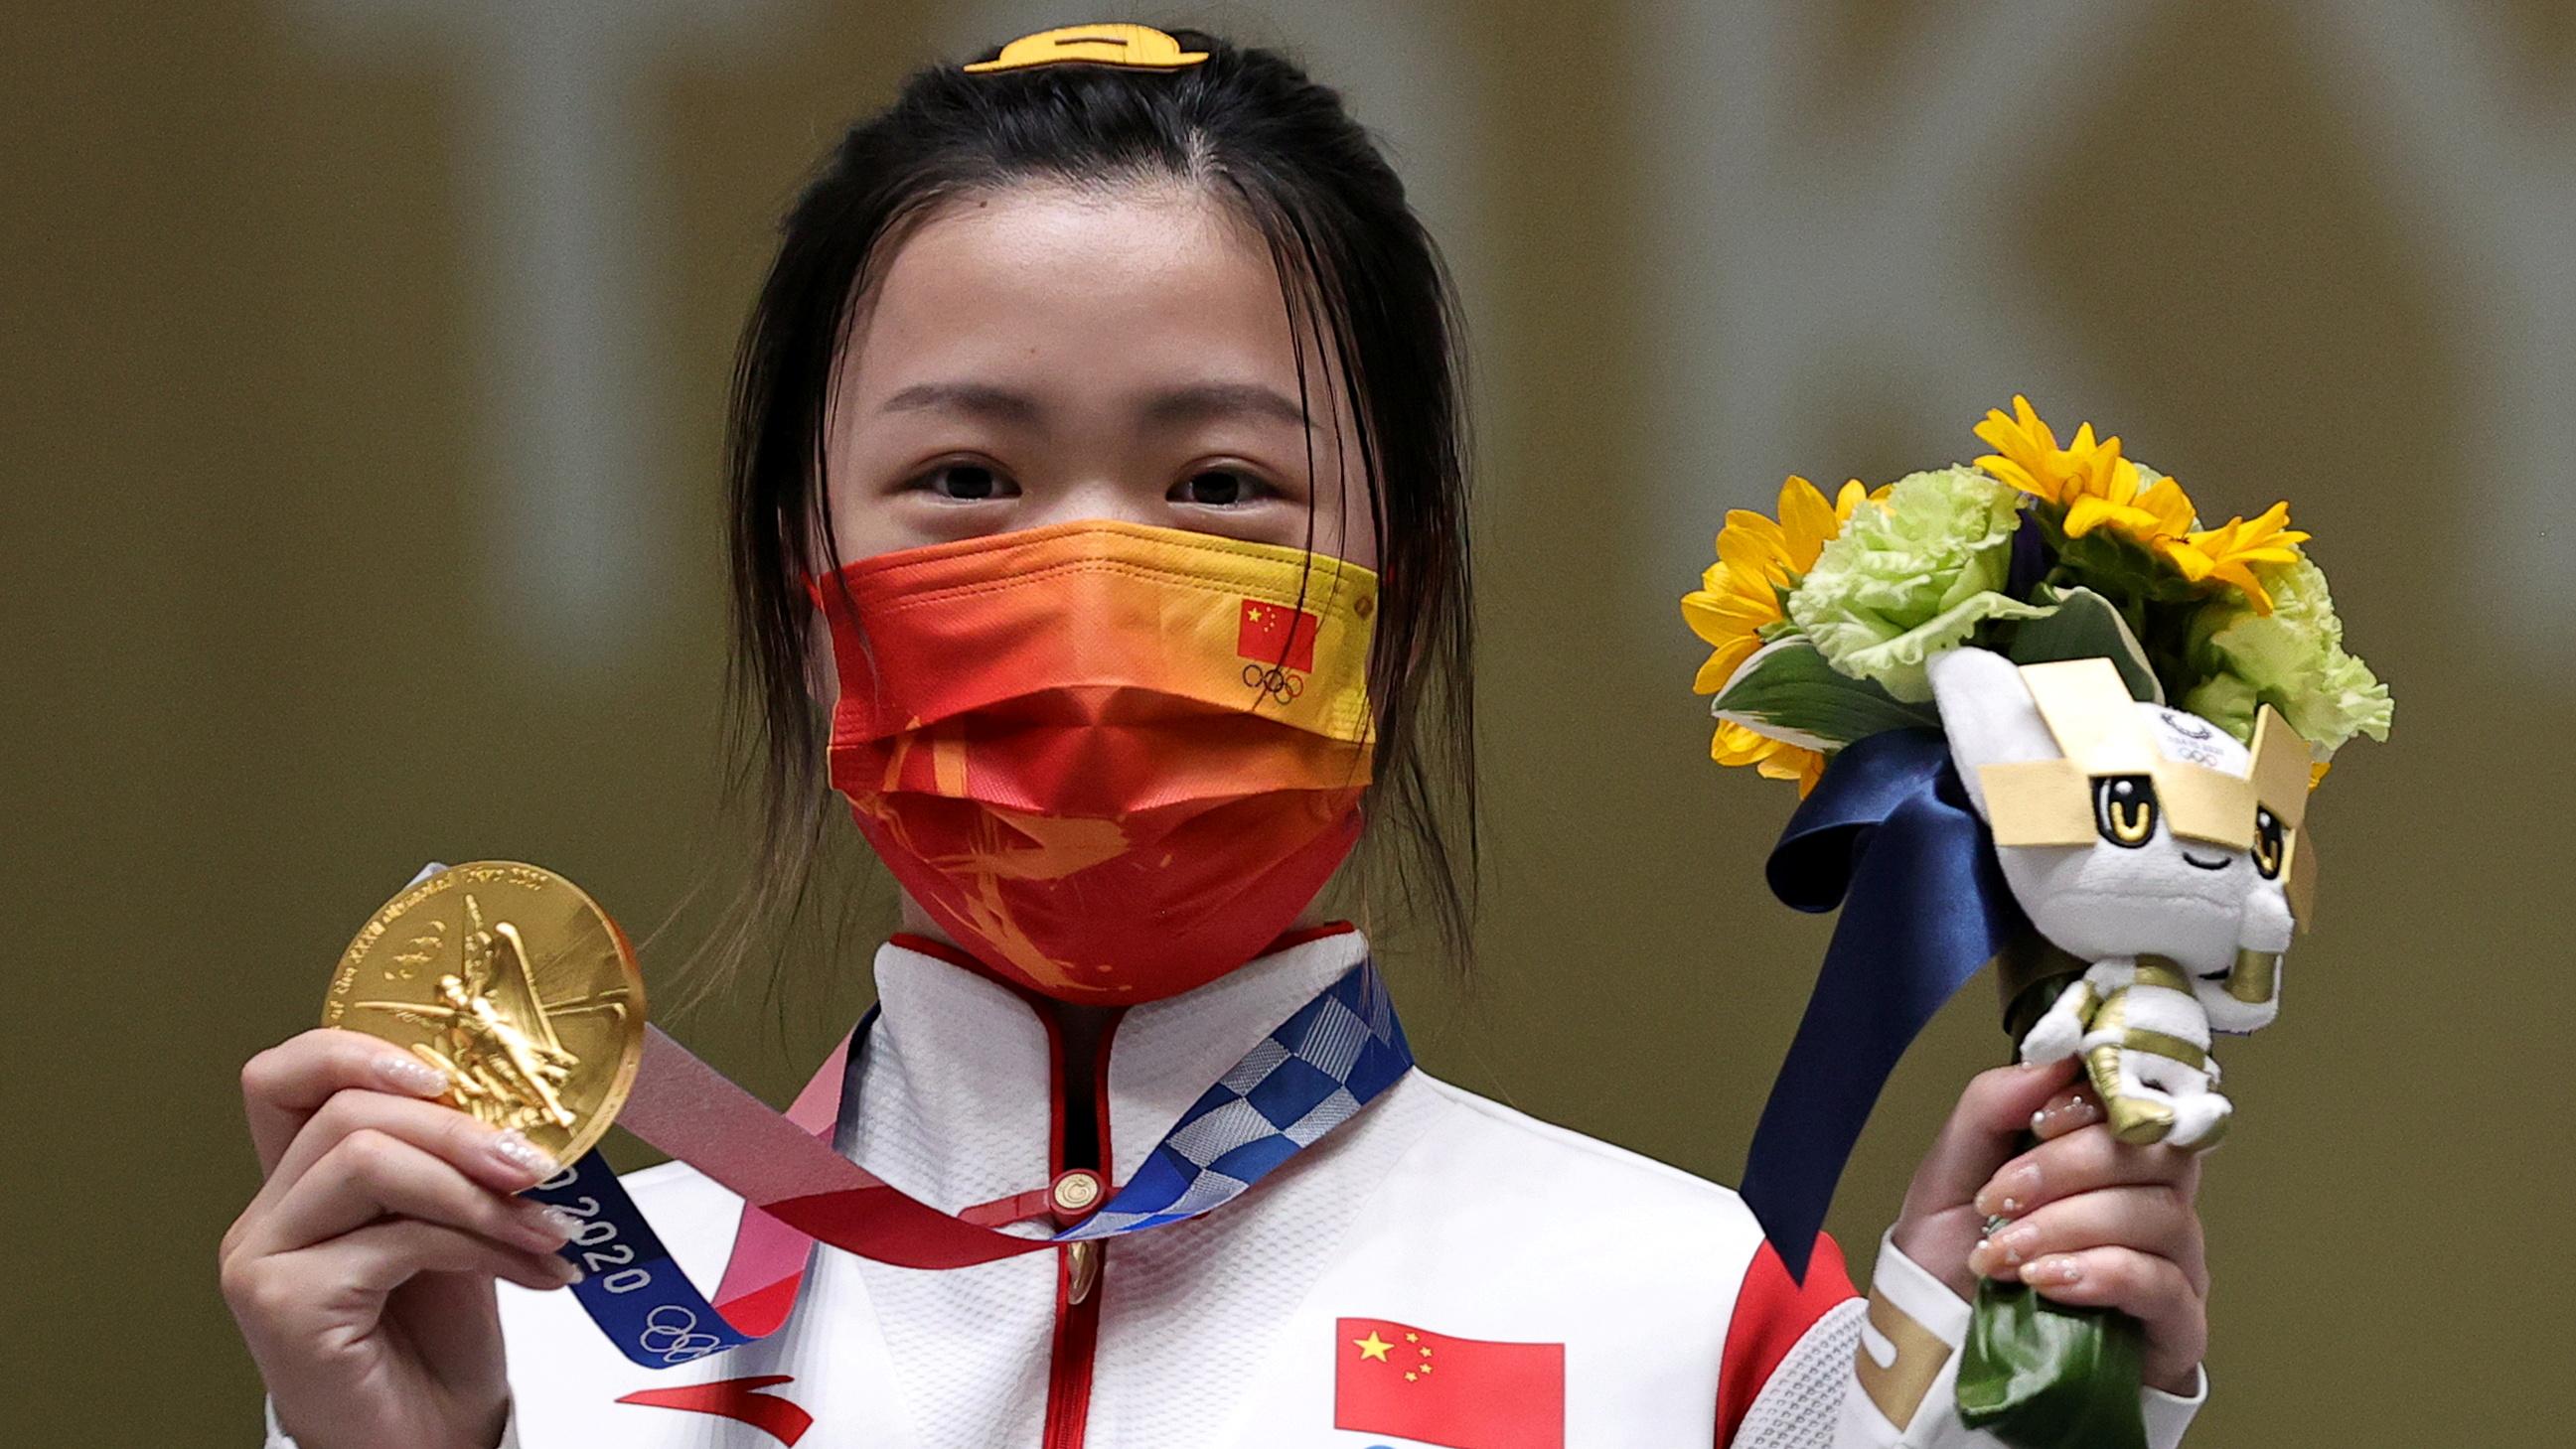 Tokyo 2020 Olympics - Shooting - Women's 10m Air Rifle - Medal Ceremony - Asaka Shooting Range, Tokyo, Japan – July 24, 2021. Gold medallist Yang Qian of China celebrates on the podium REUTERS/Ann Wang